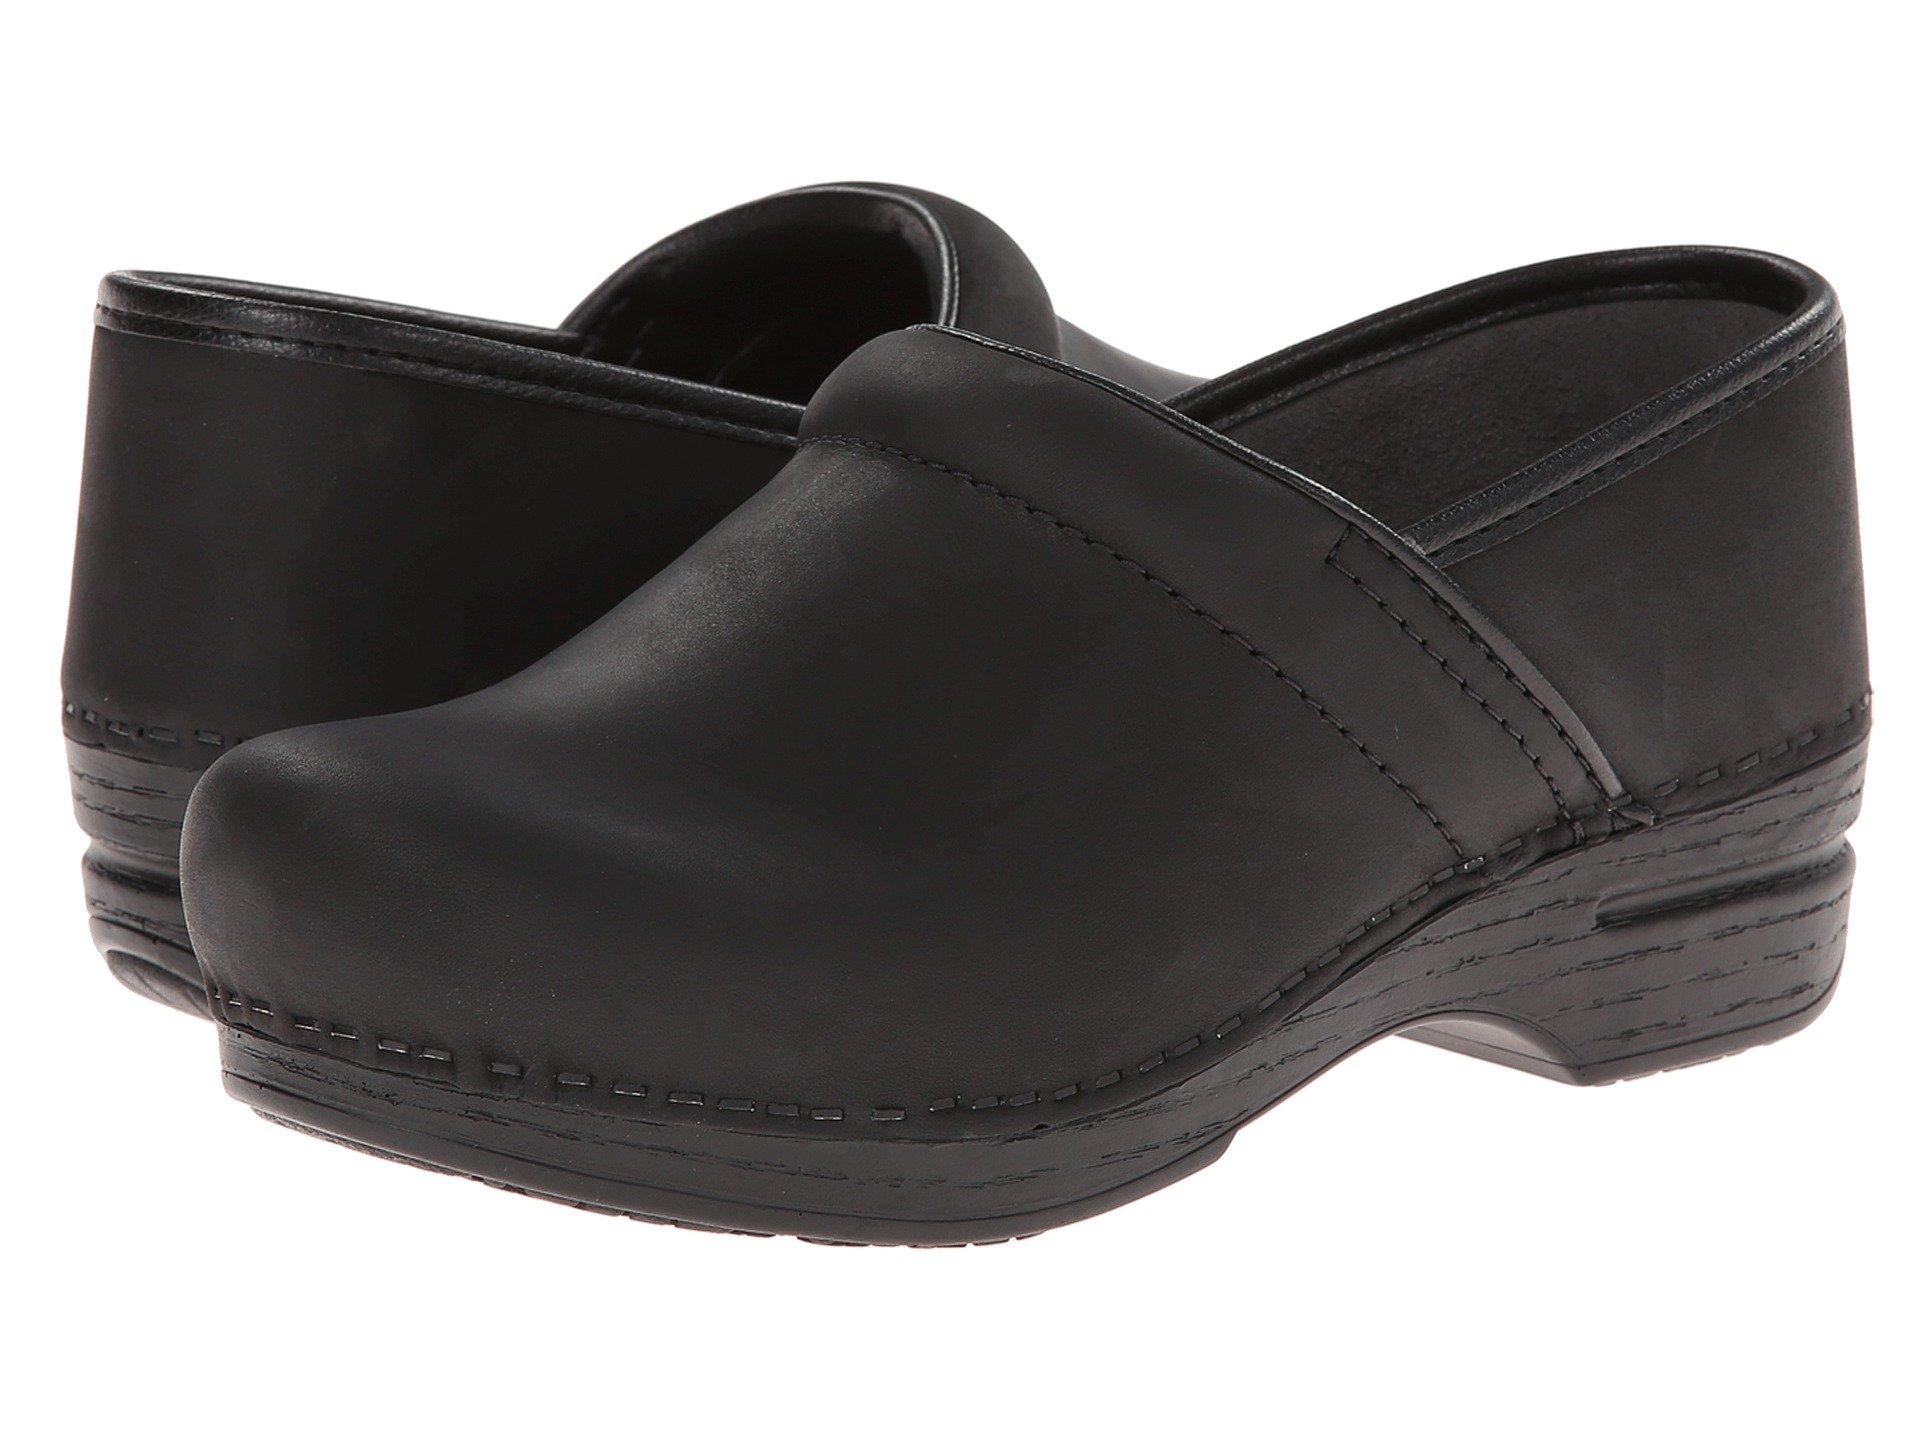 frye shoes for men 7 \/52 leadership series toastmasters logo im